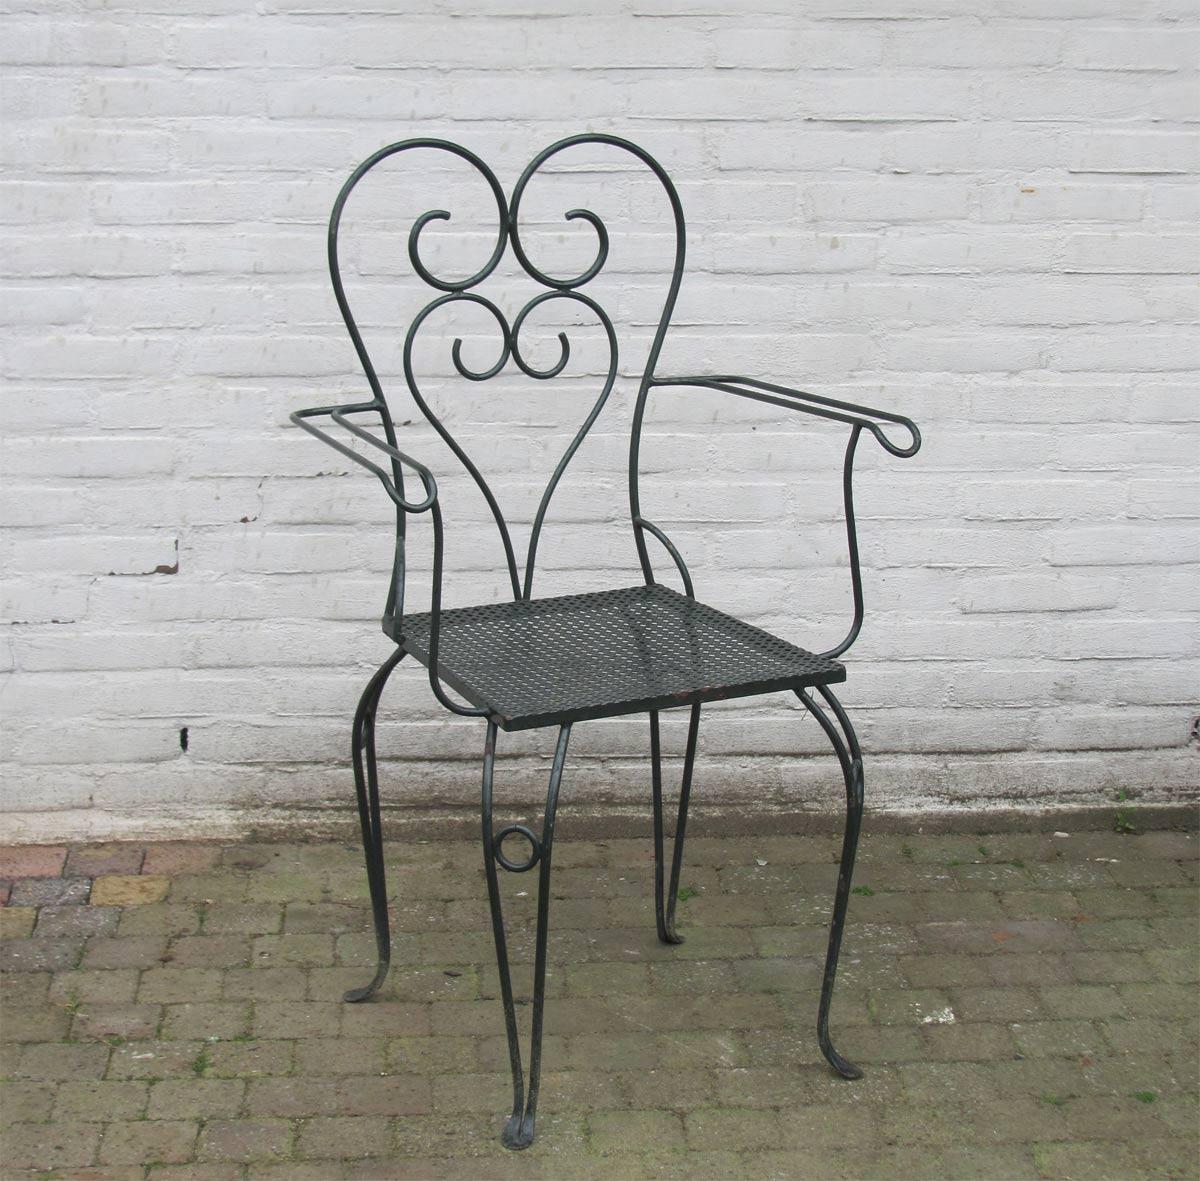 Siersmedrij groosman tuinmeubilair - Tuin meubilair ...